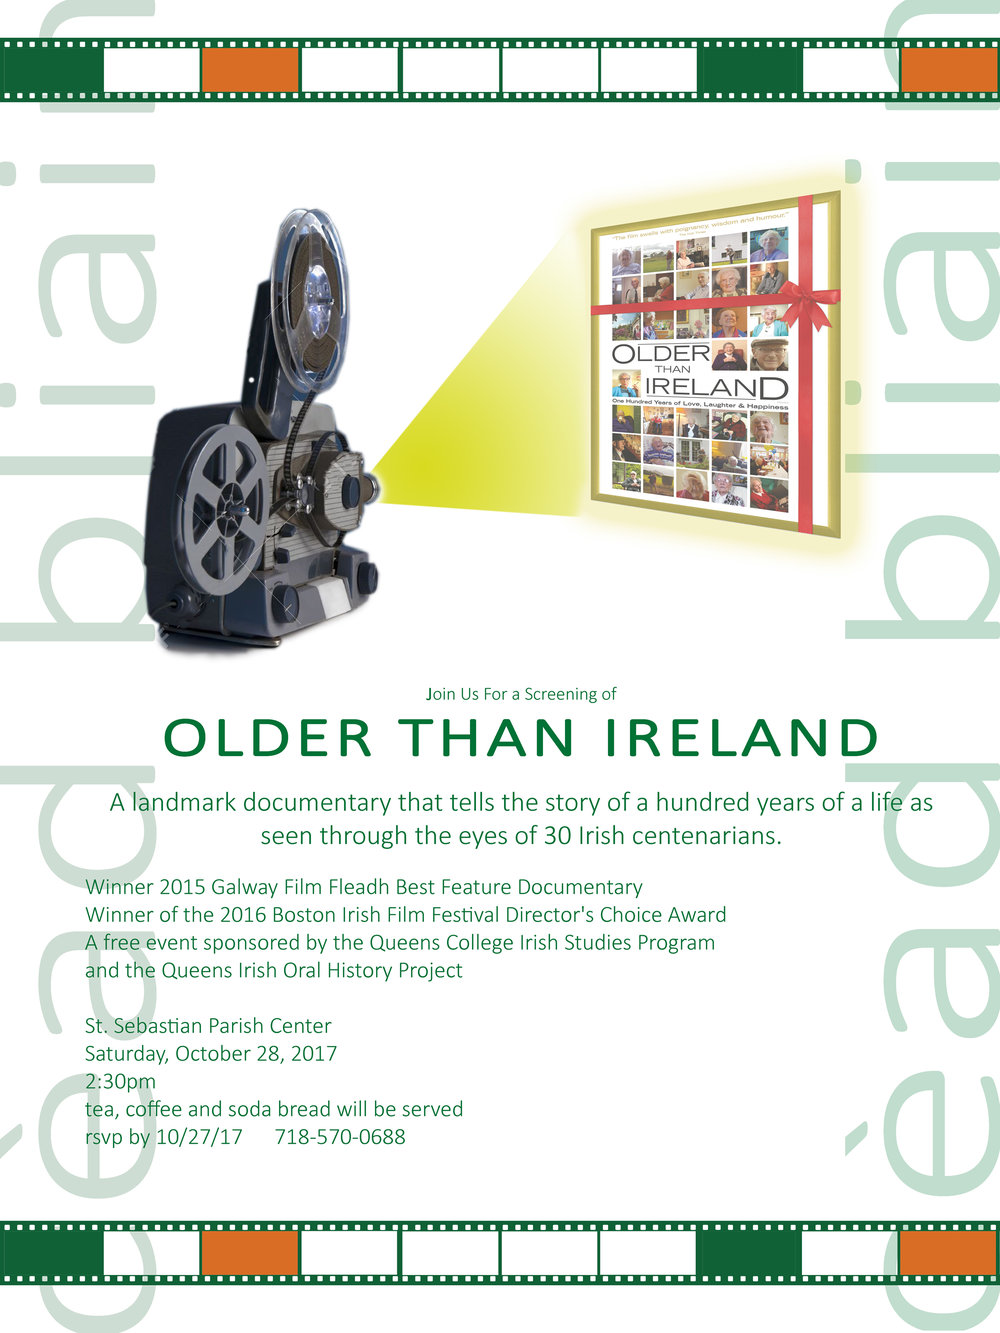 Older Than Ireland poster.jpg